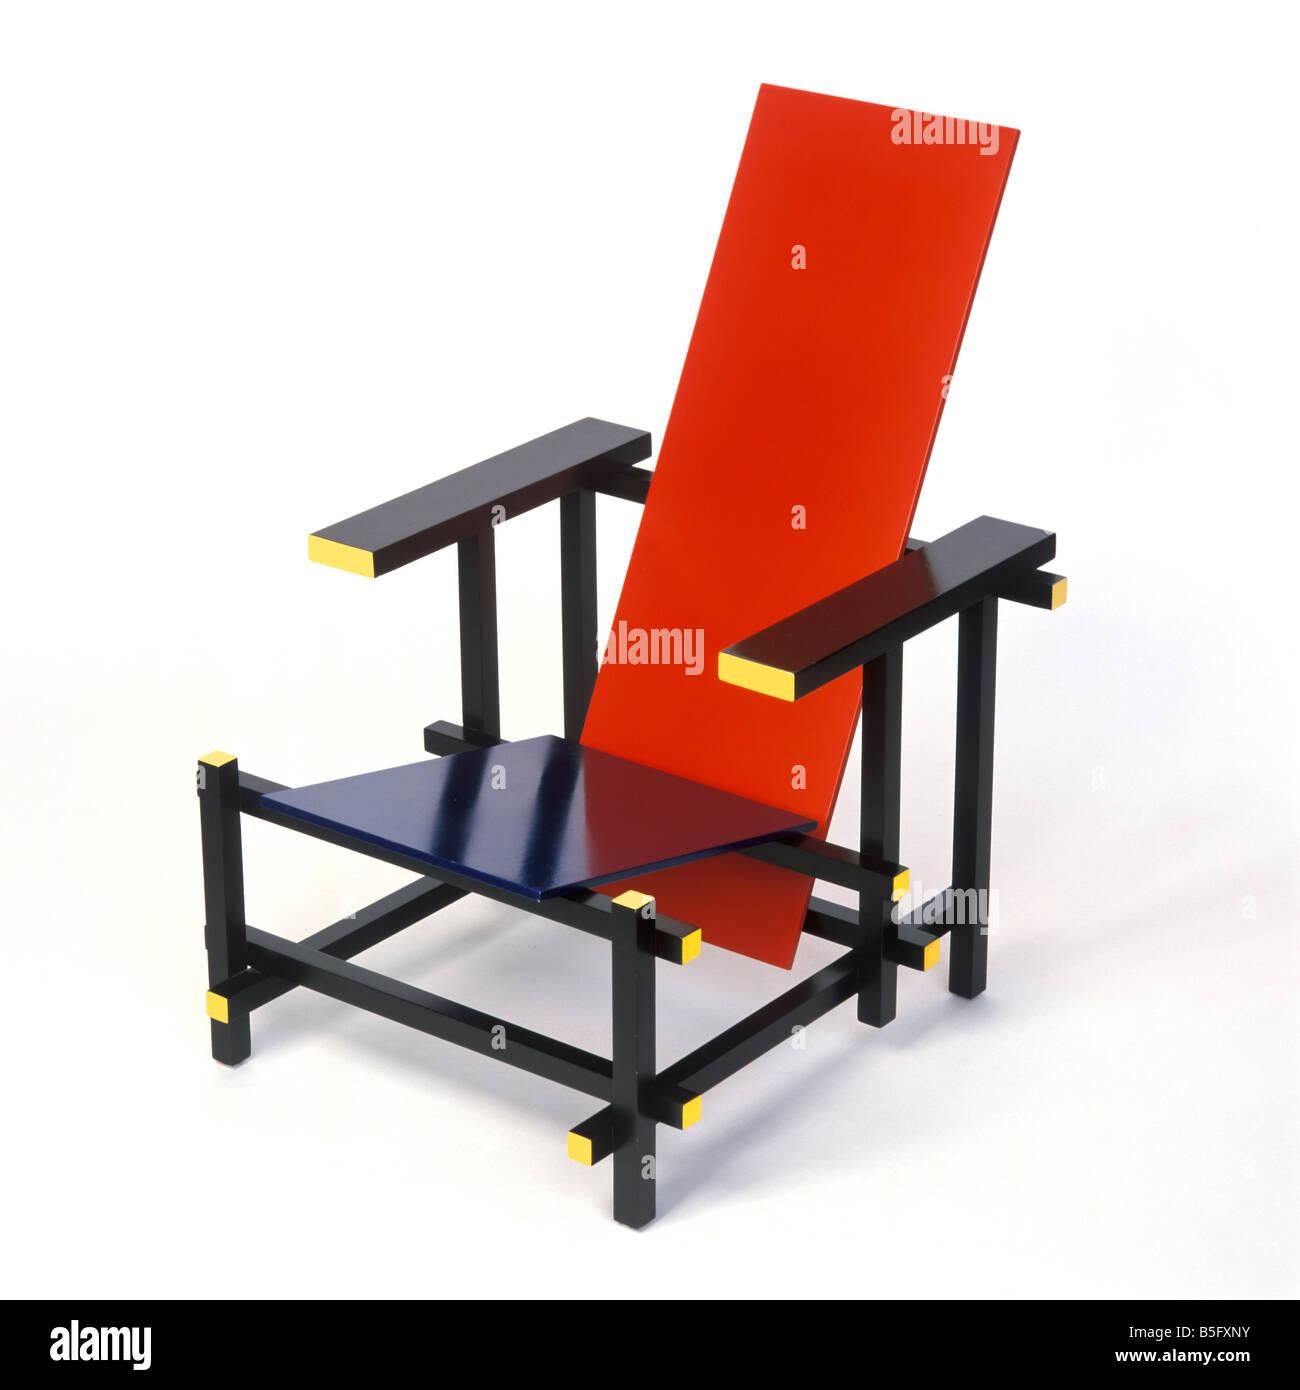 gerrit rietveld stockfotos gerrit rietveld bilder alamy. Black Bedroom Furniture Sets. Home Design Ideas